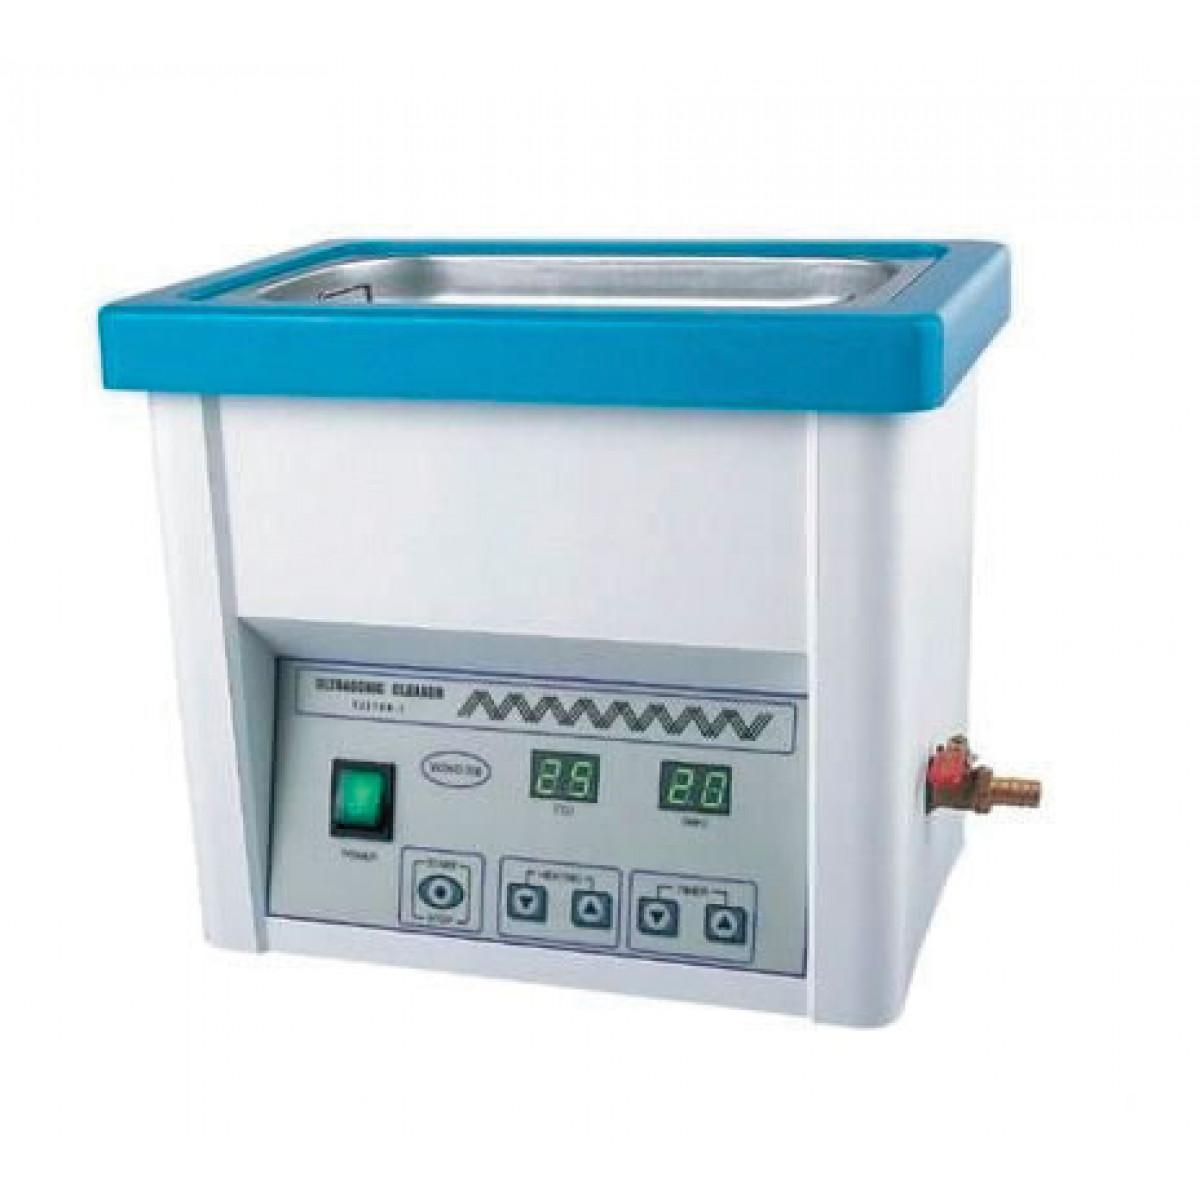 Economy Ultrasonic Bath 4.5L - Ultrasonic Baths - Ultrasonic ...